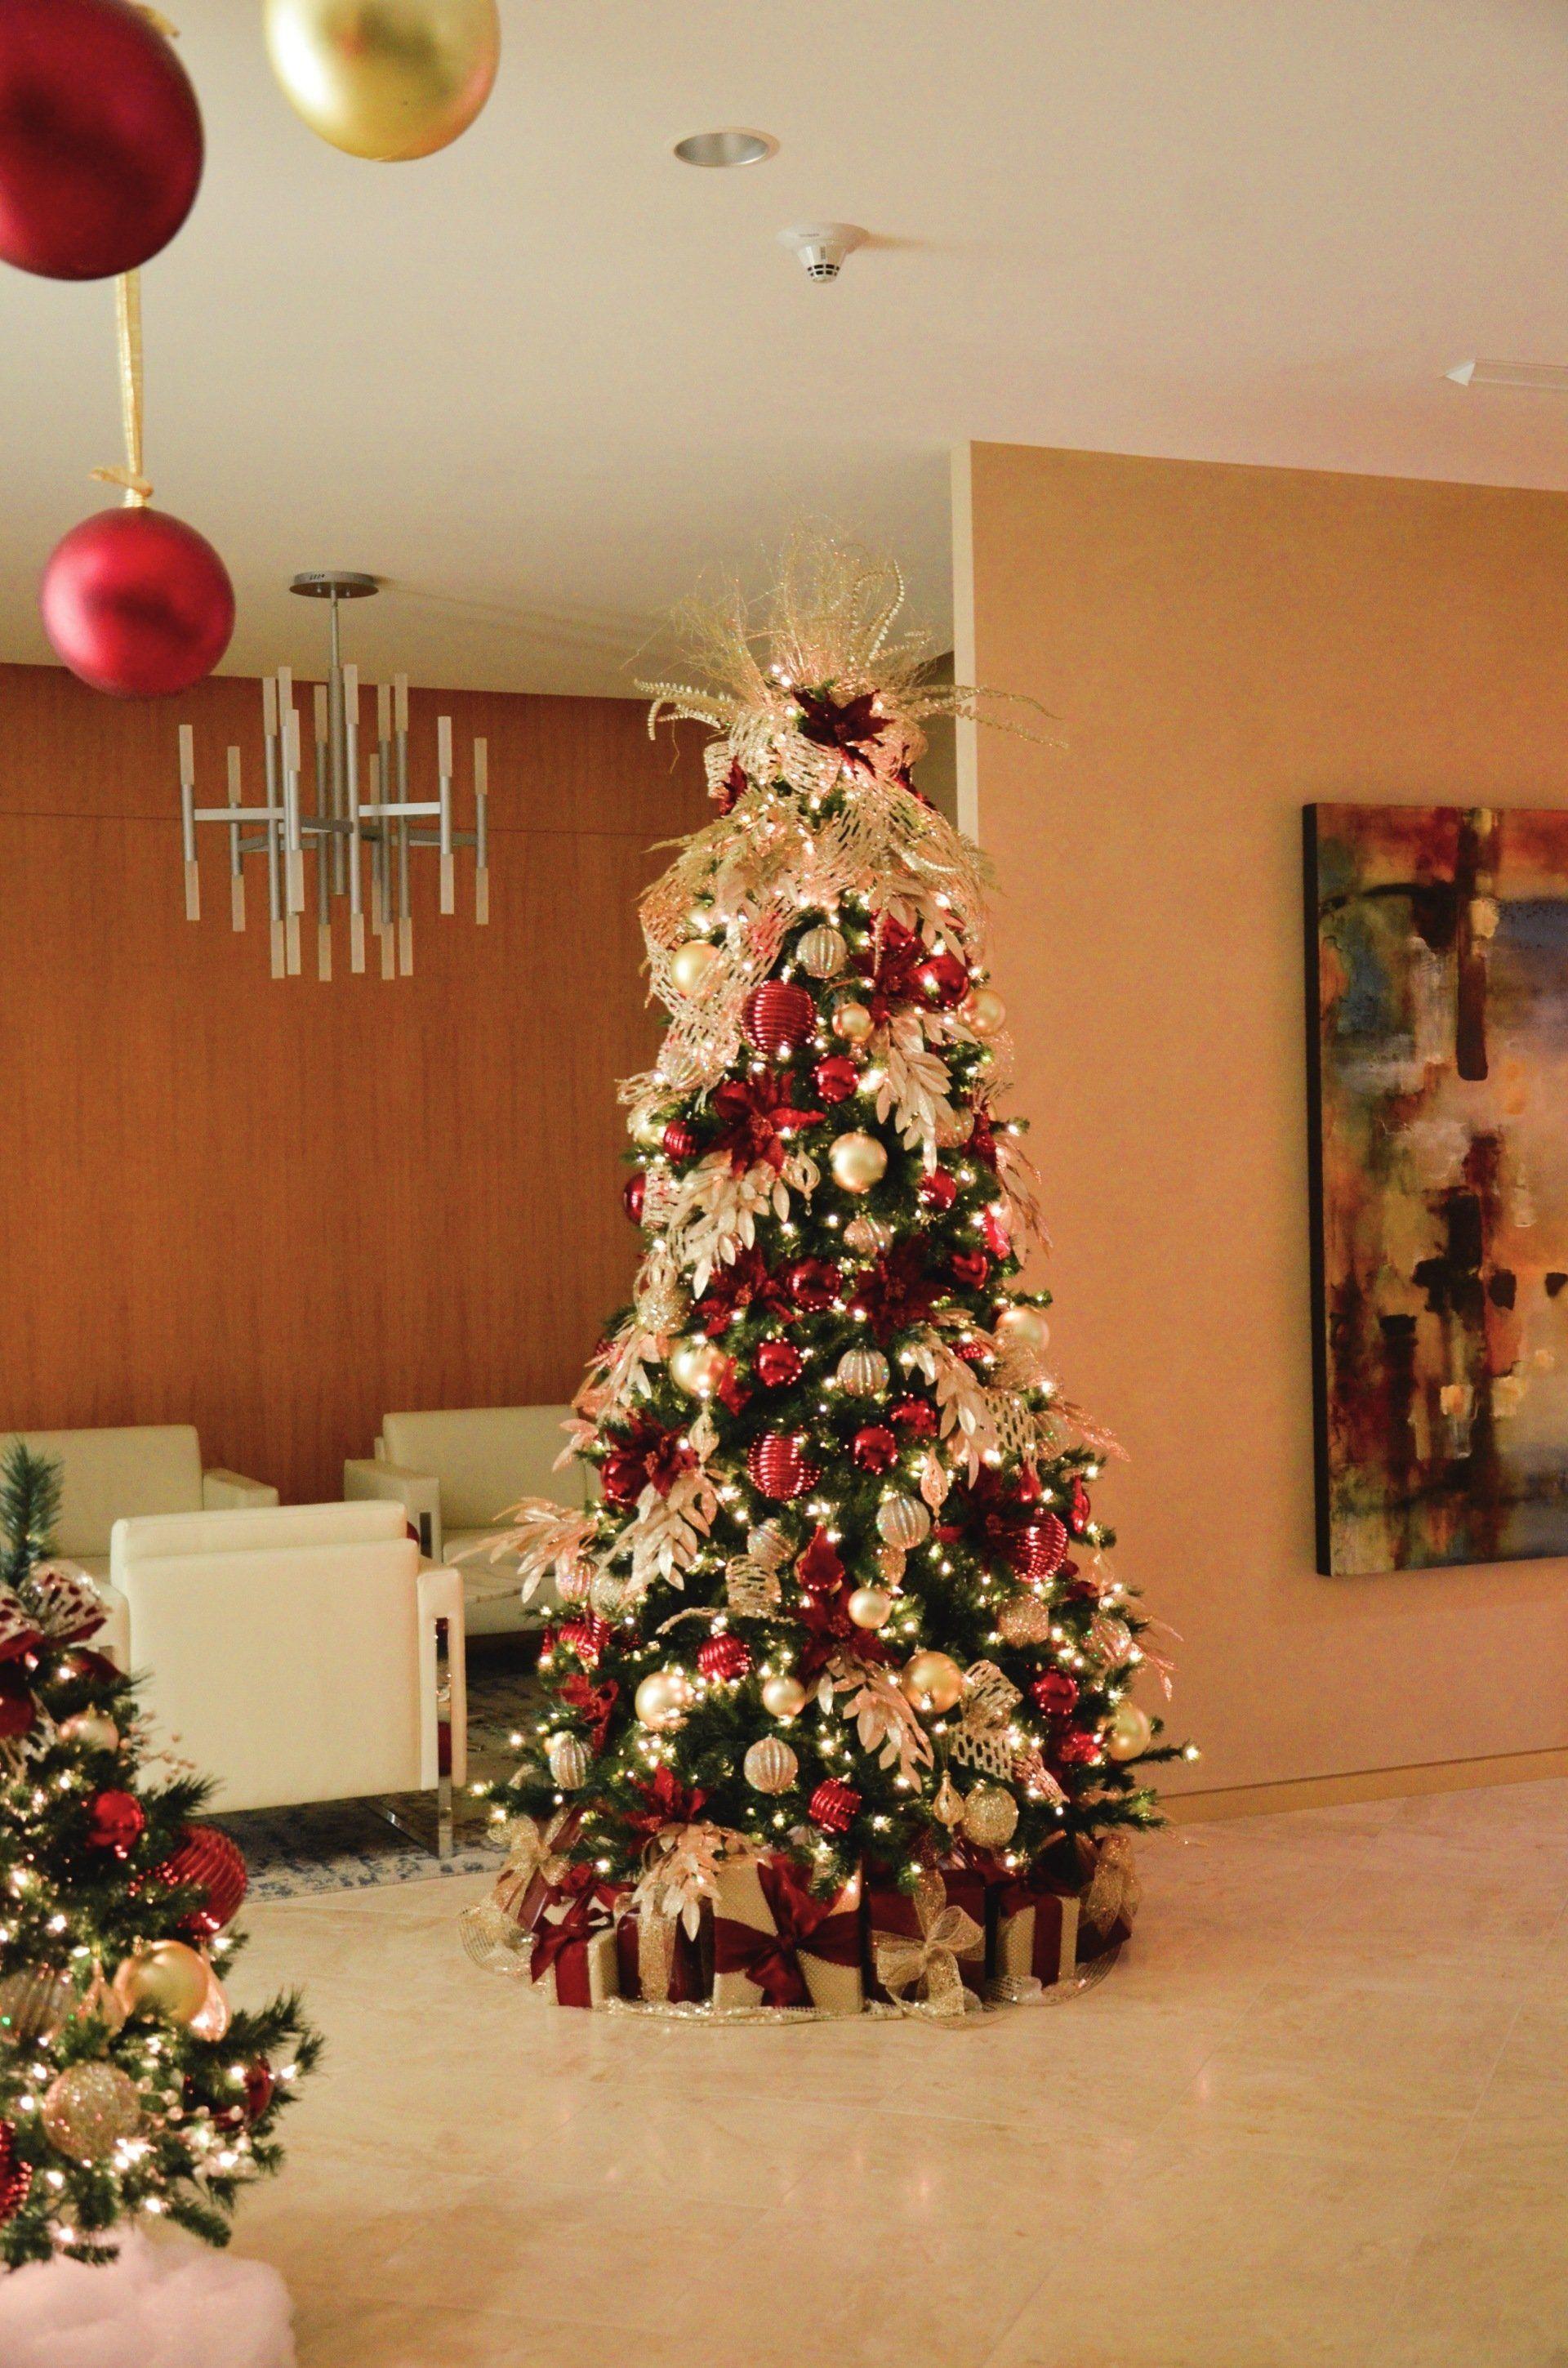 Los Angeles Commercial Christmas Decorators